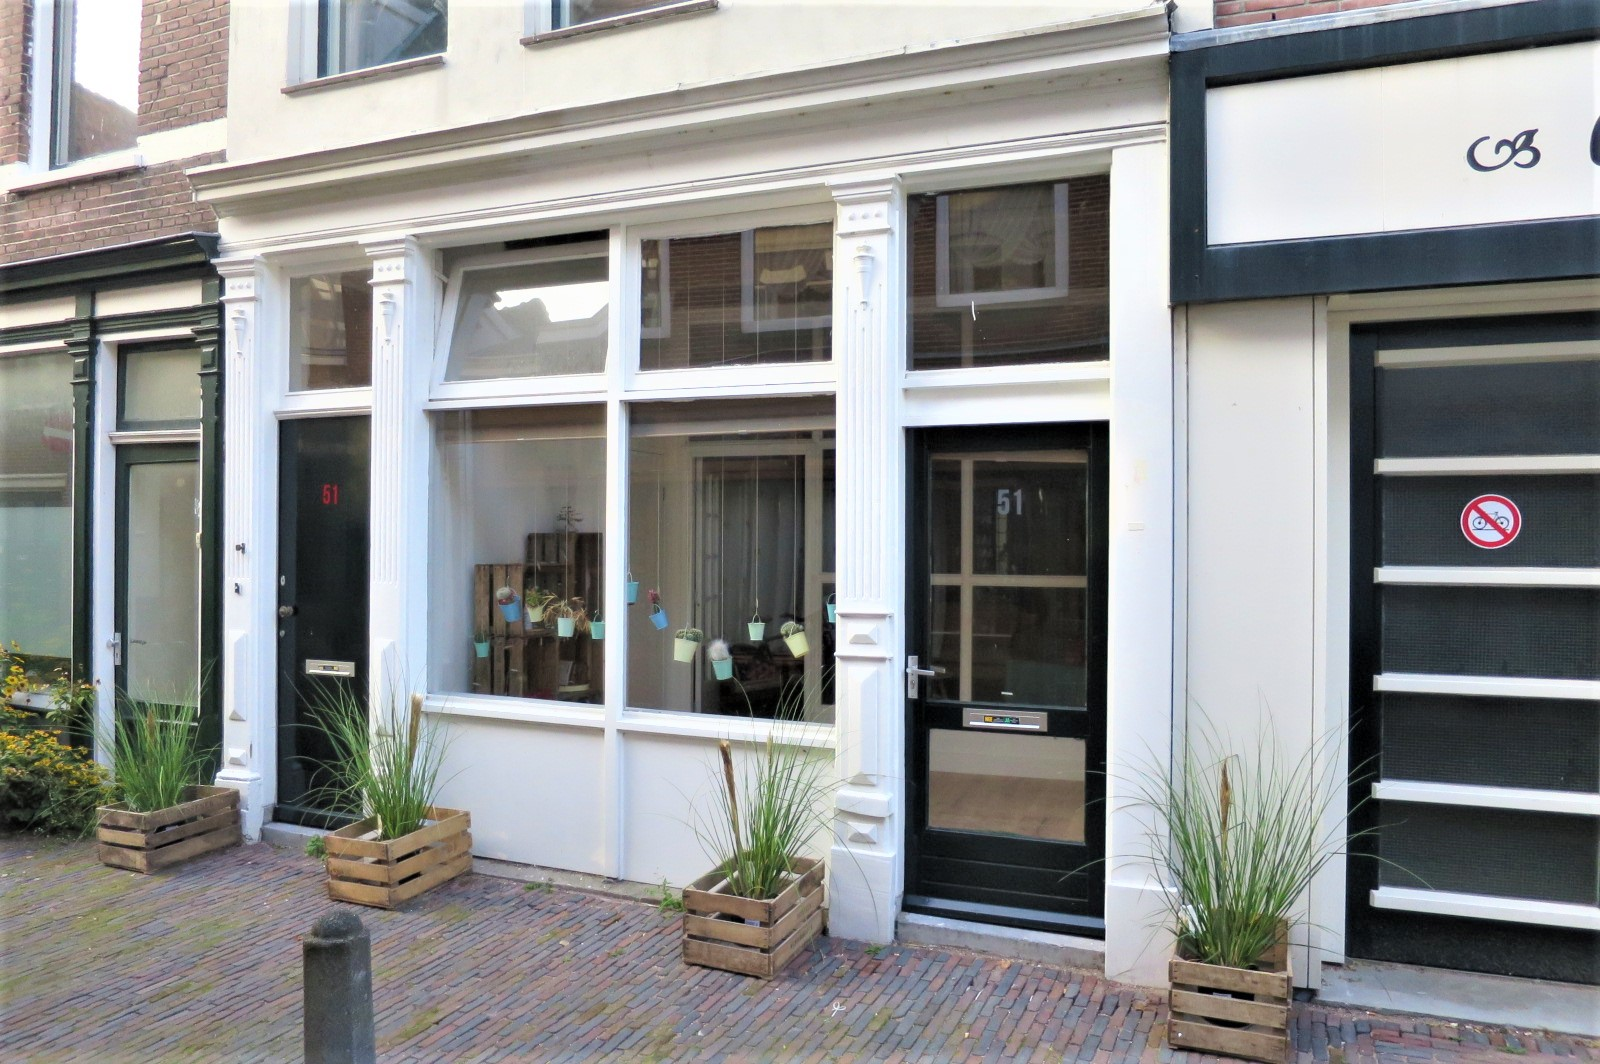 Hagestraat 51zw, Haarlem